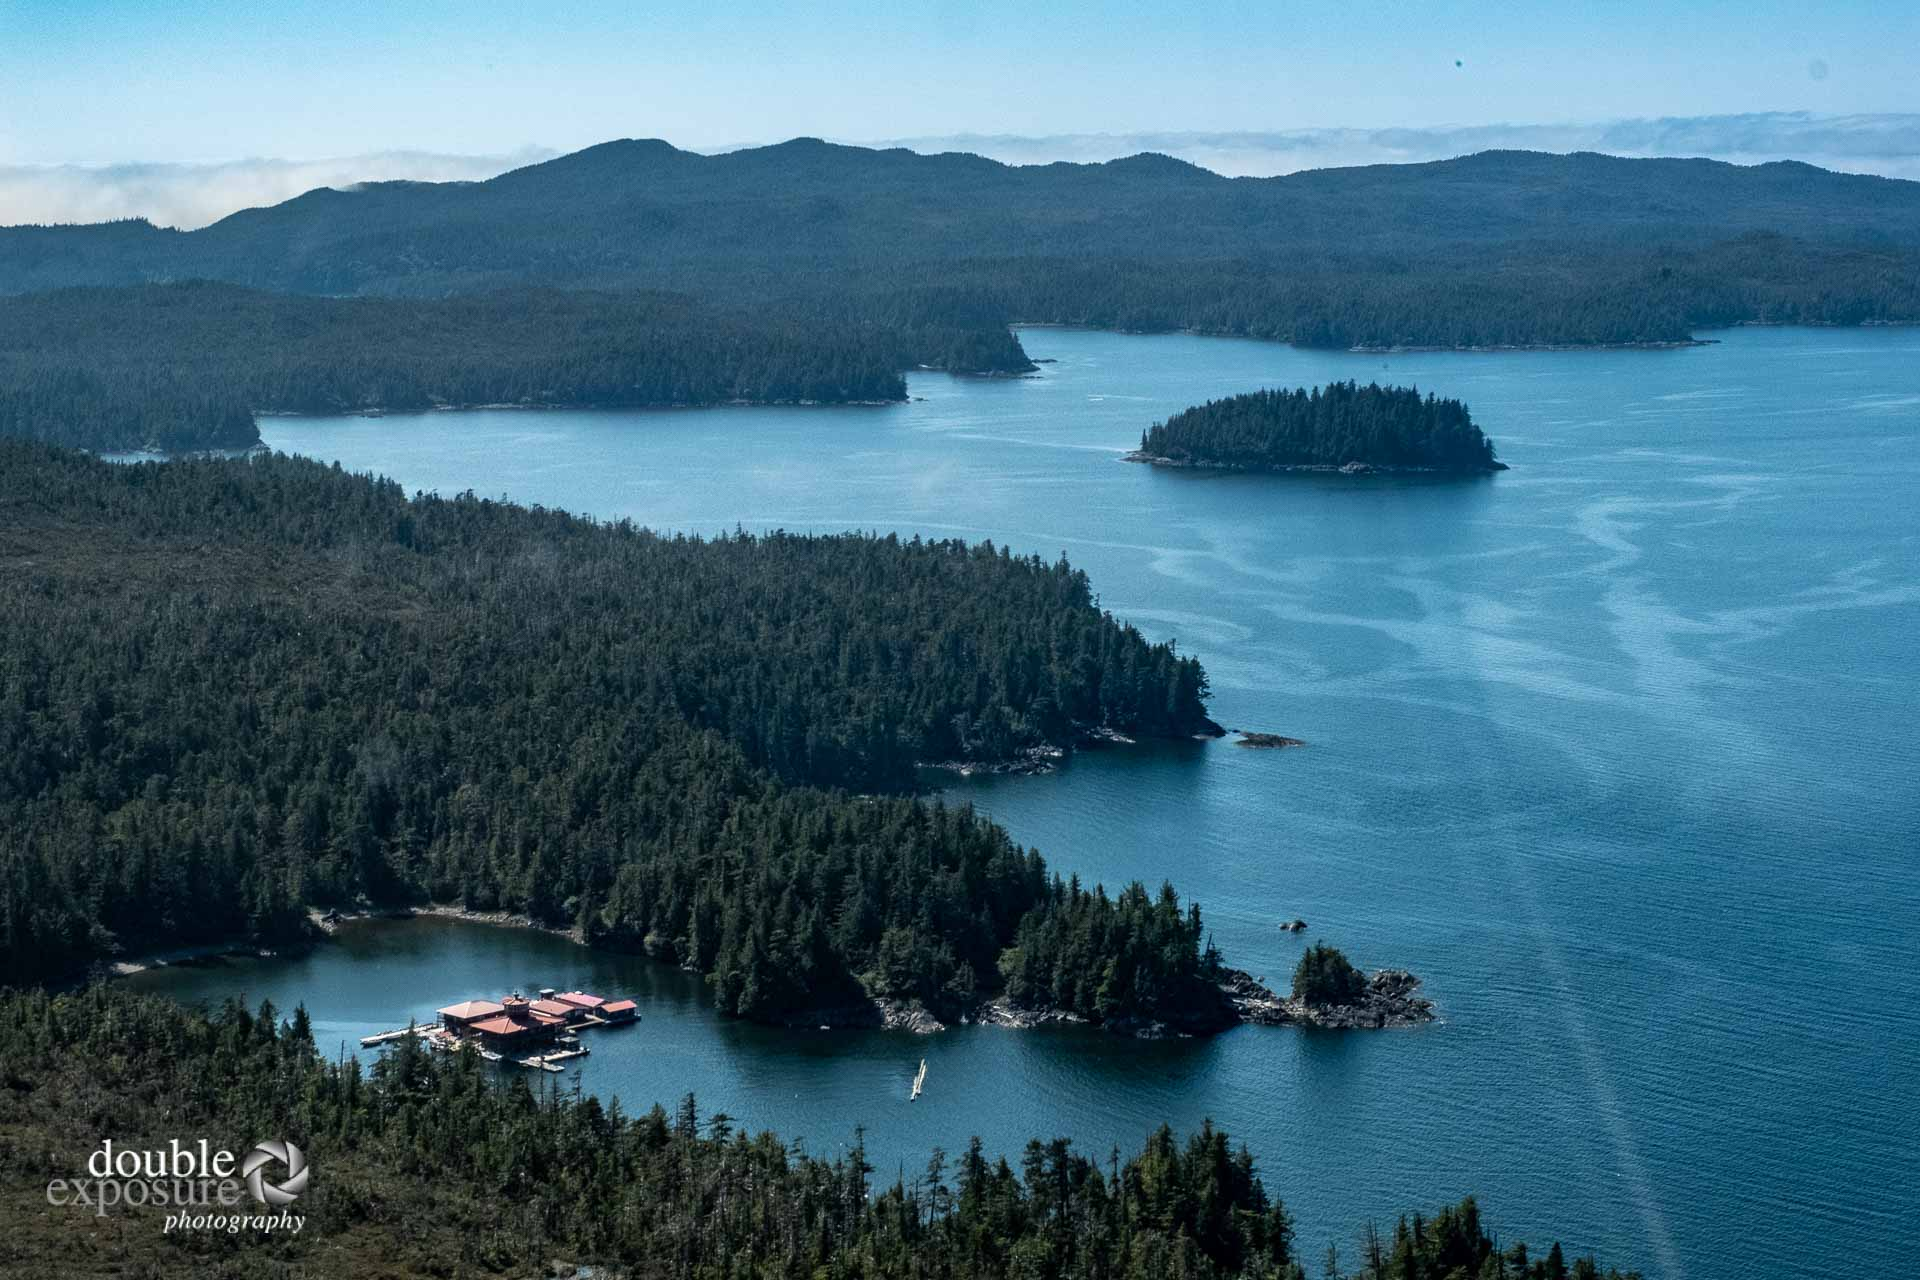 aerial view of Dundas Island, BC